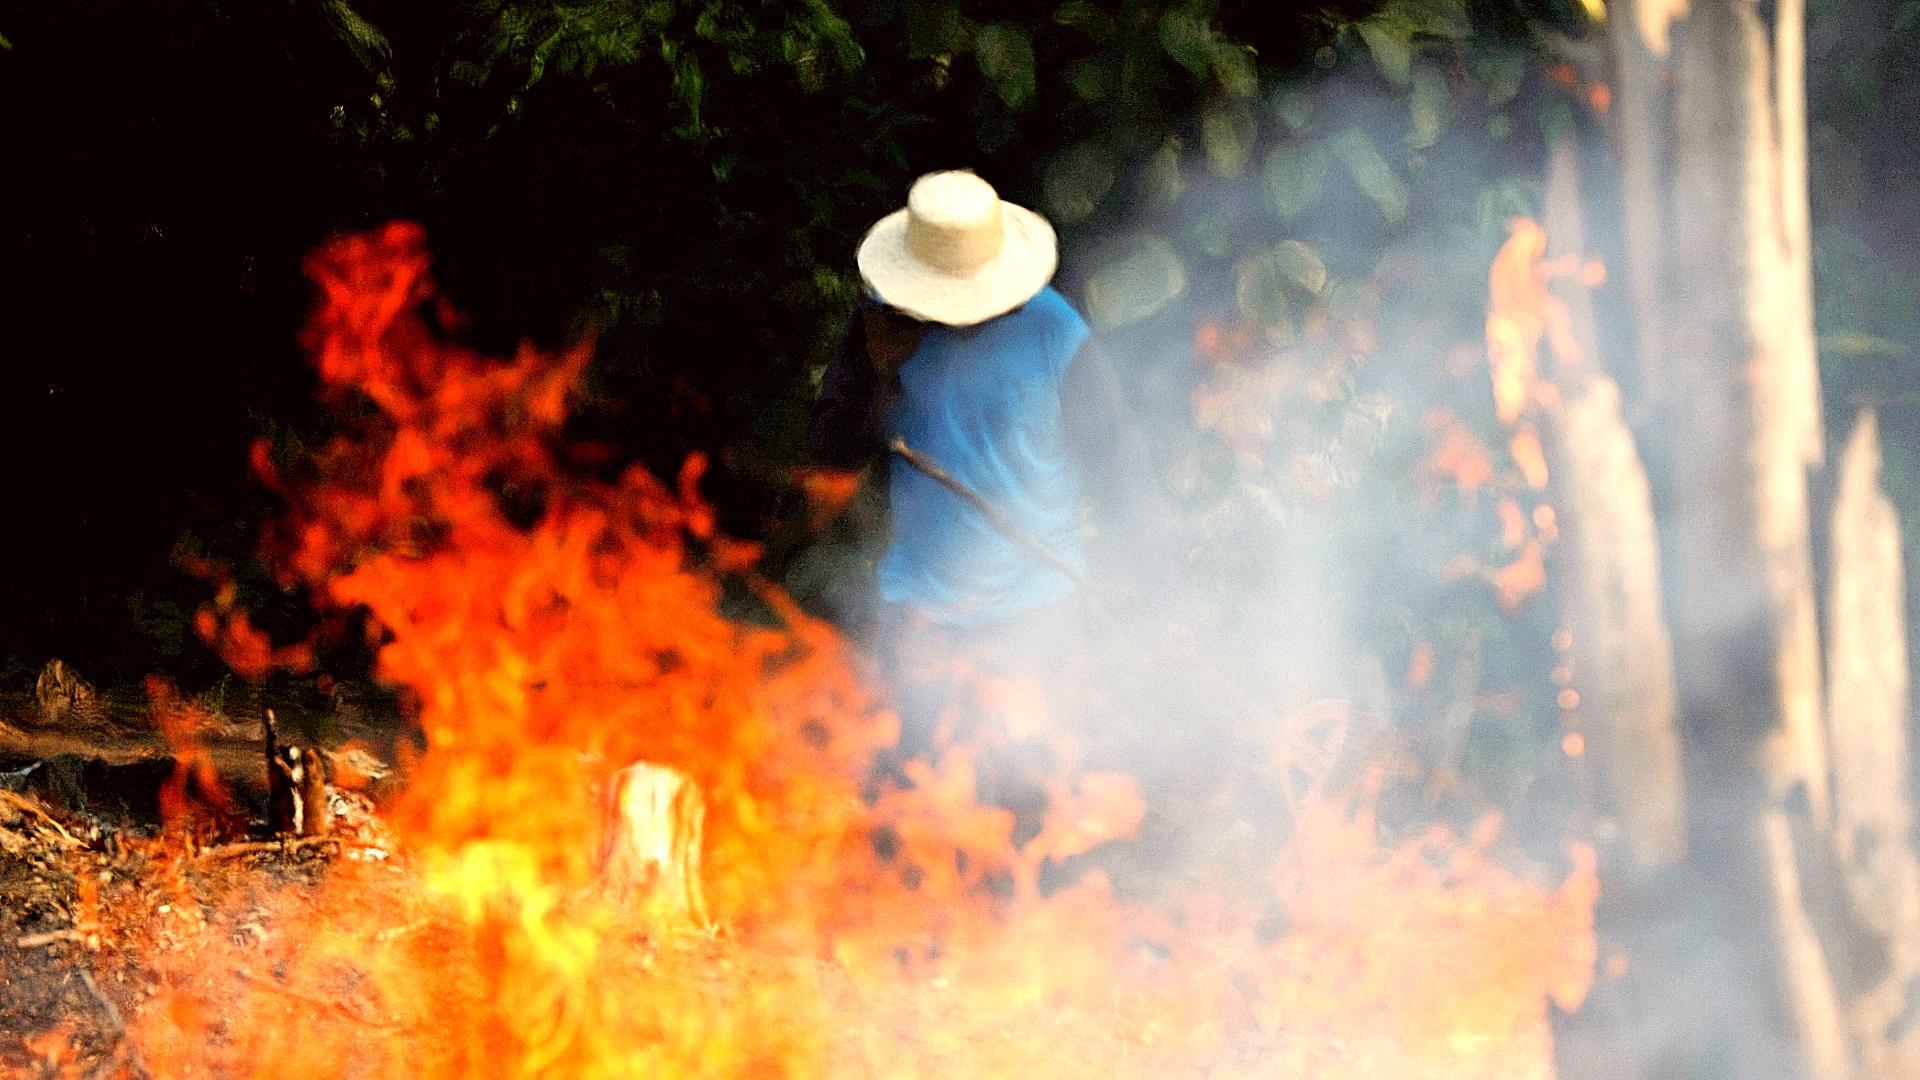 Emmanuel Macron Threatens To Block EU Trade Deal With Brazil Over Amazon Fires